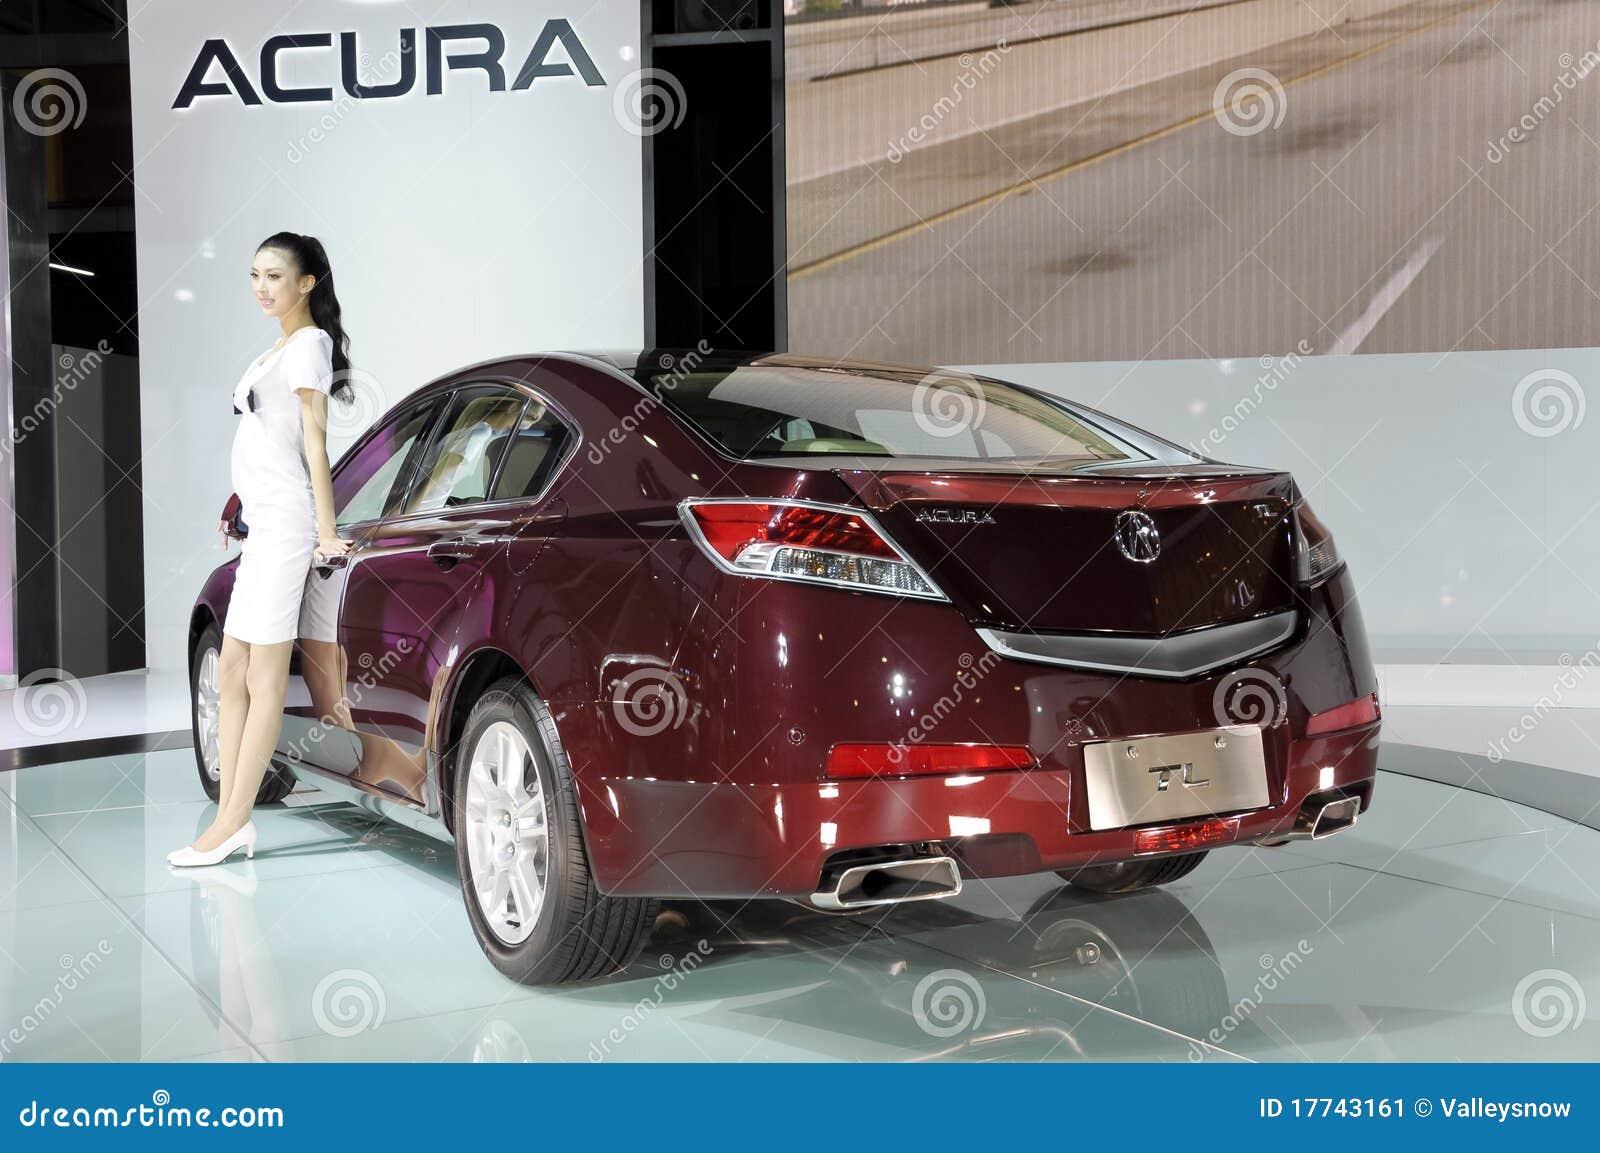 Honda Acura Tl Foto Editorial Imagen De Acura Honda 17743161